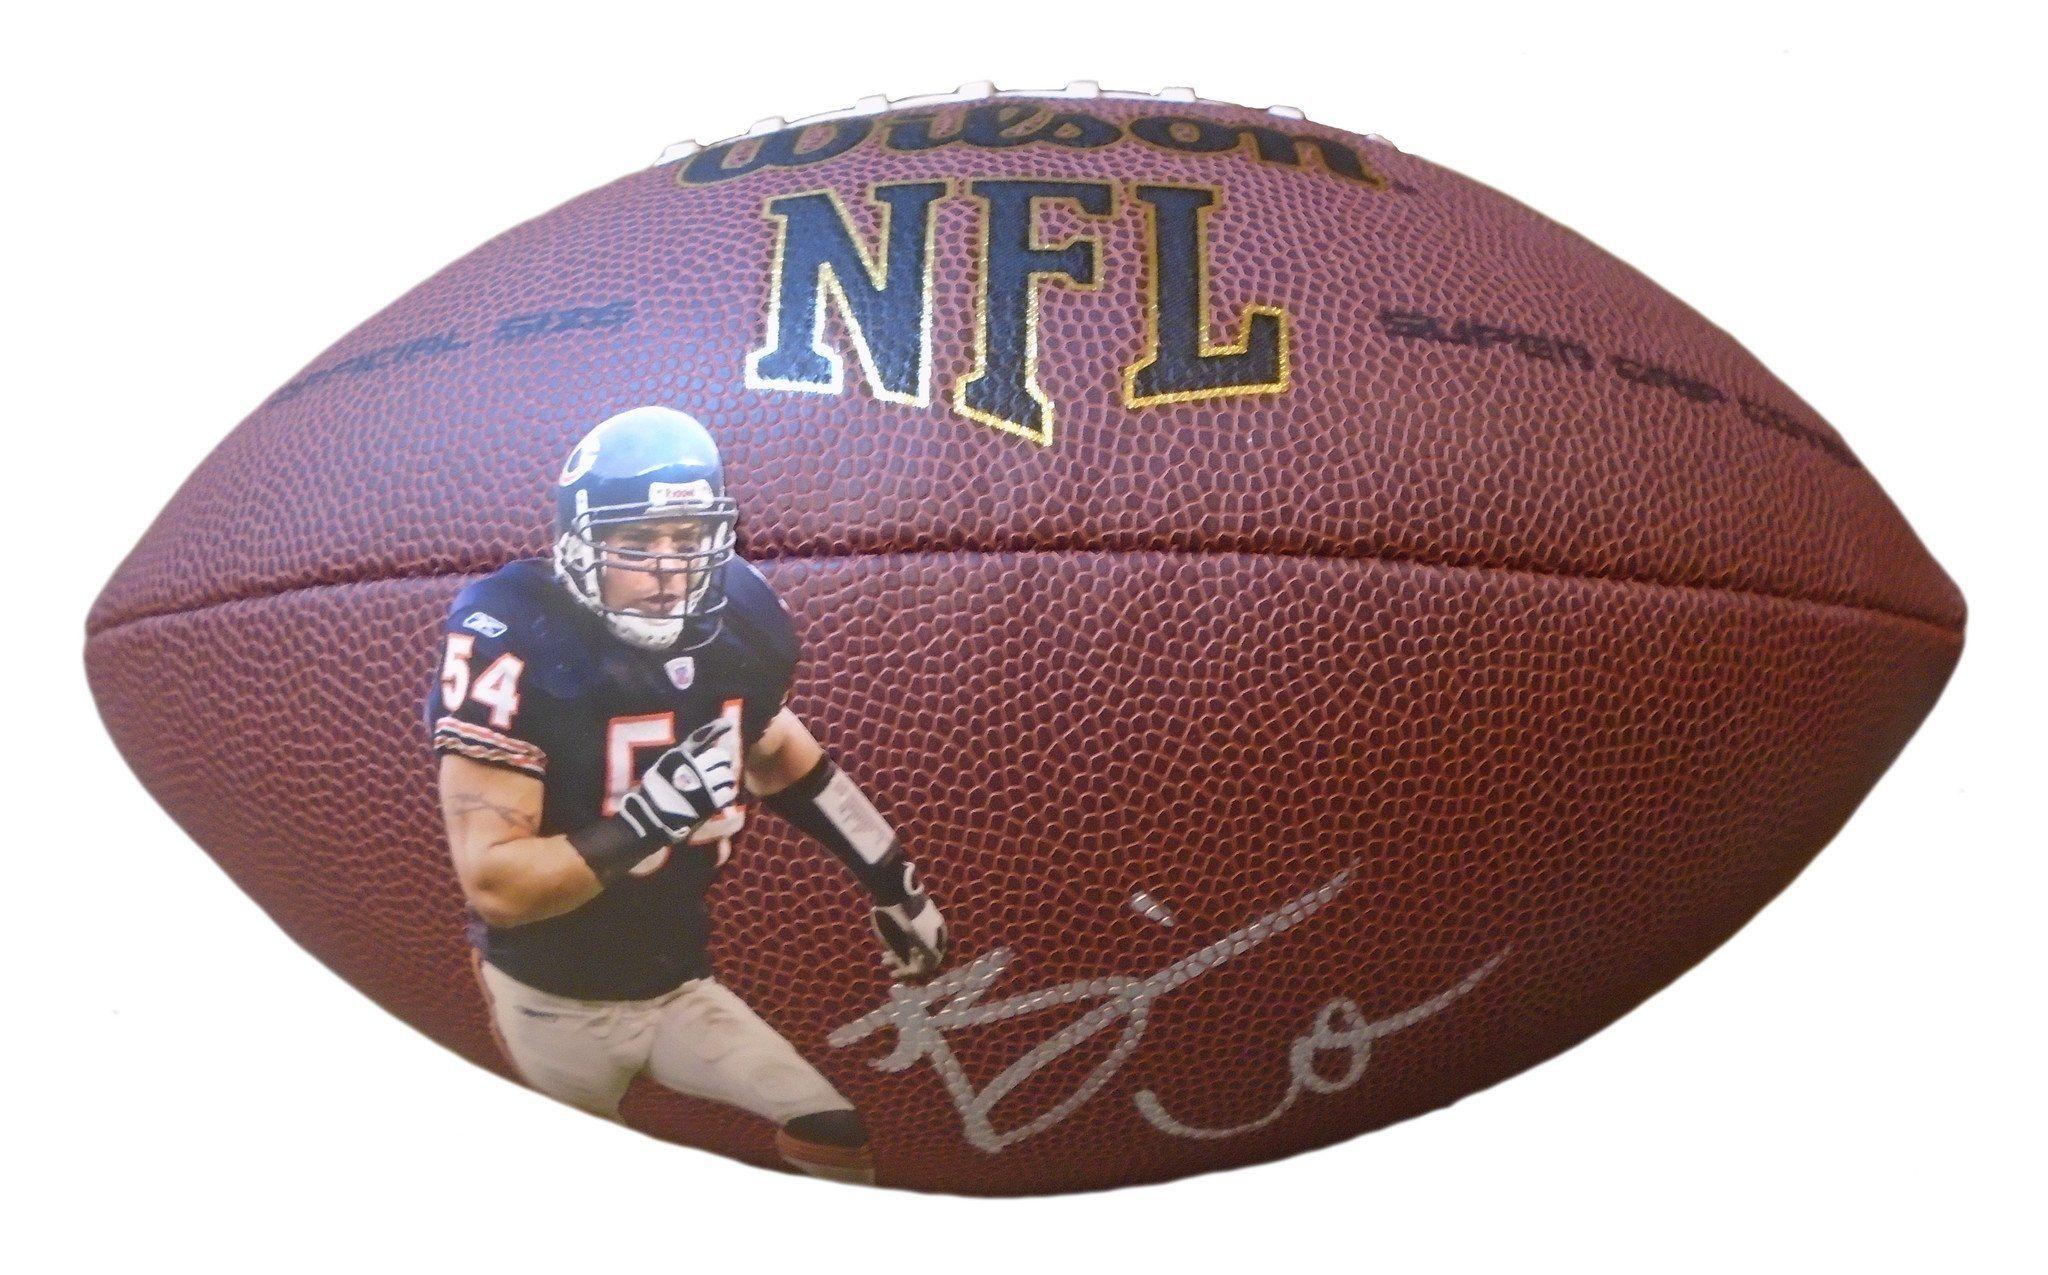 new product 7d56a 6c6c1 Brian Urlacher Autographed Custom Chicago Bears Photo NFL ...